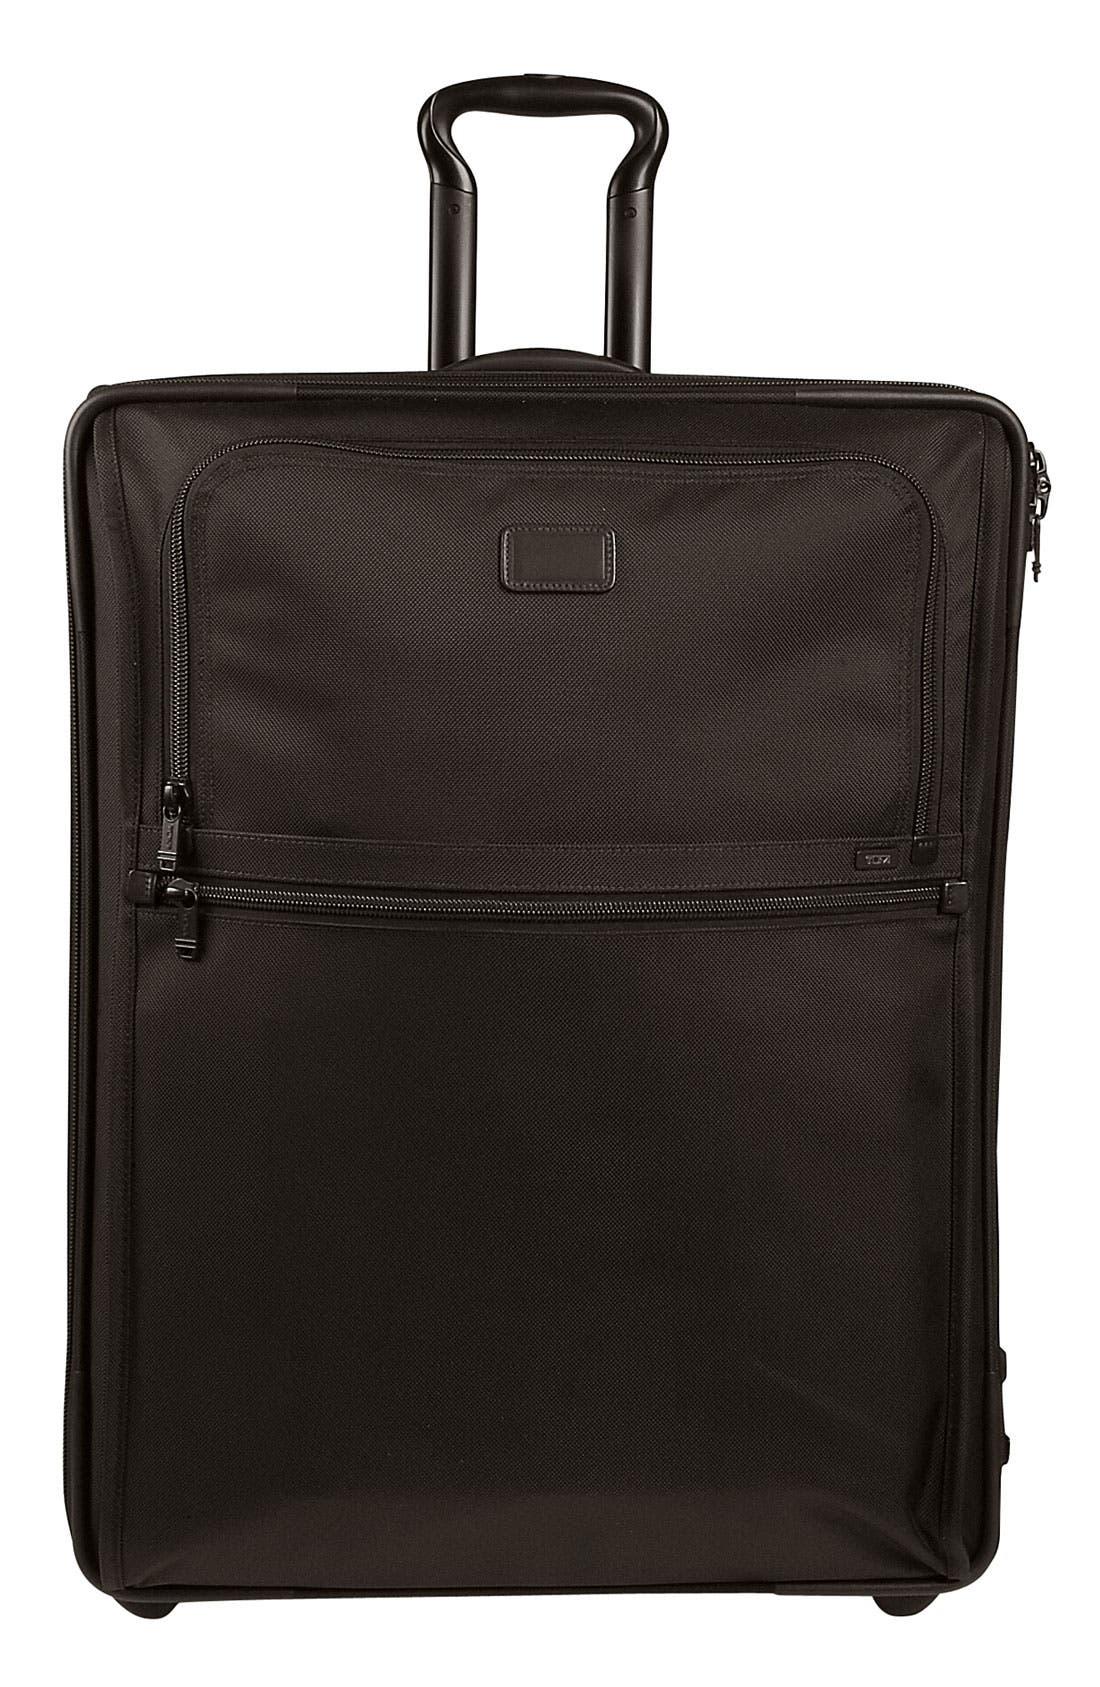 Alternate Image 1 Selected - Tumi 'Alpha - Medium' Wheeled Expandable Bag